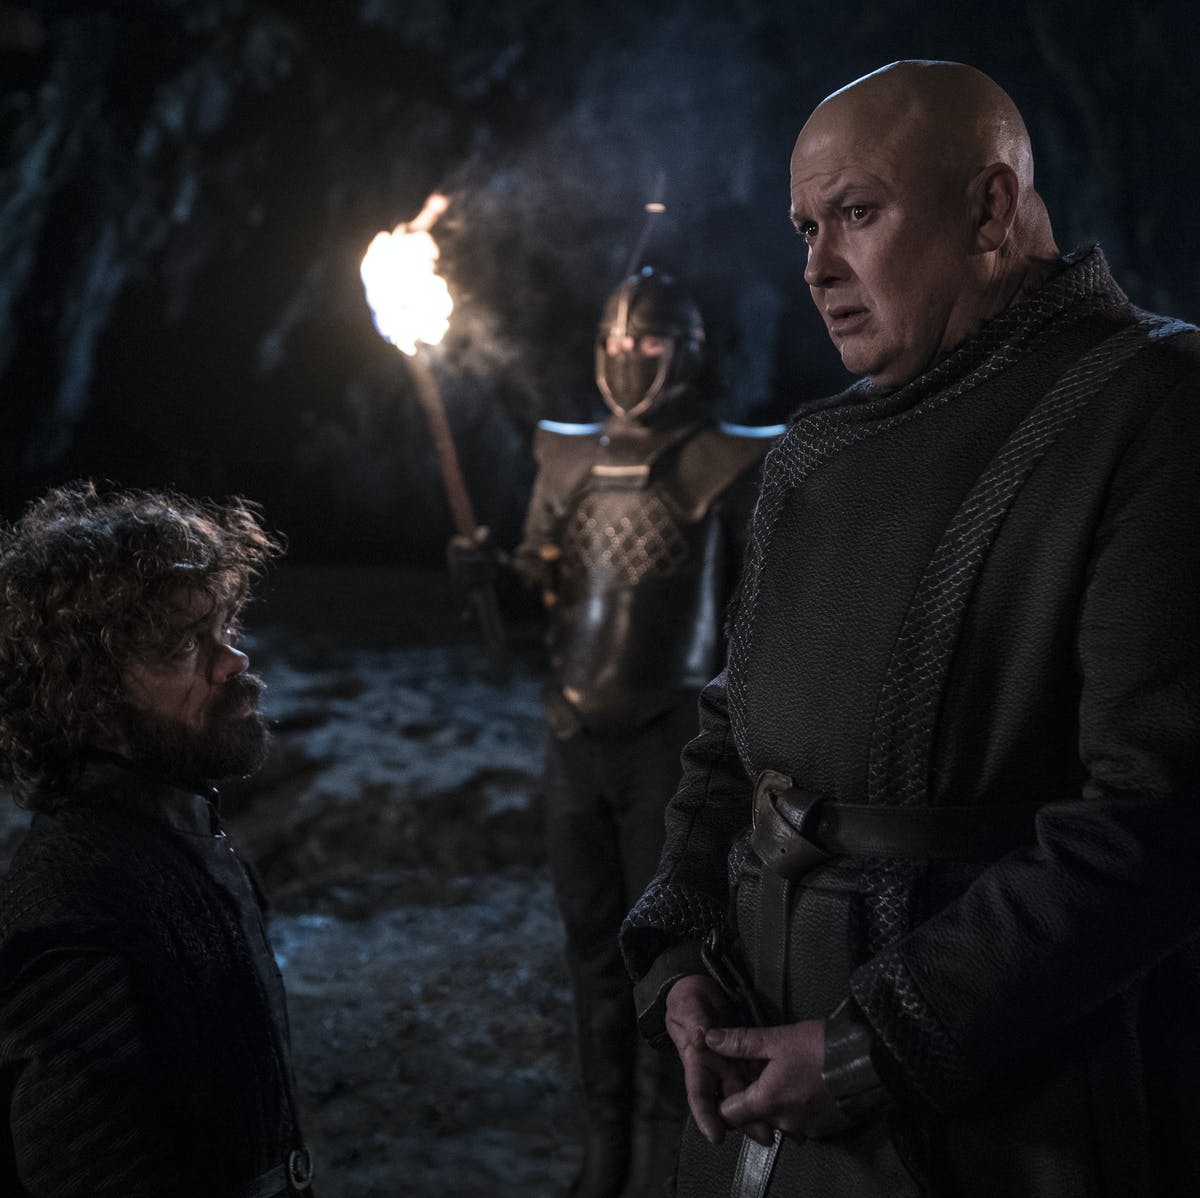 'Game of Thrones' Season 8 Theory Reveals How Varys Already Poisoned Dany